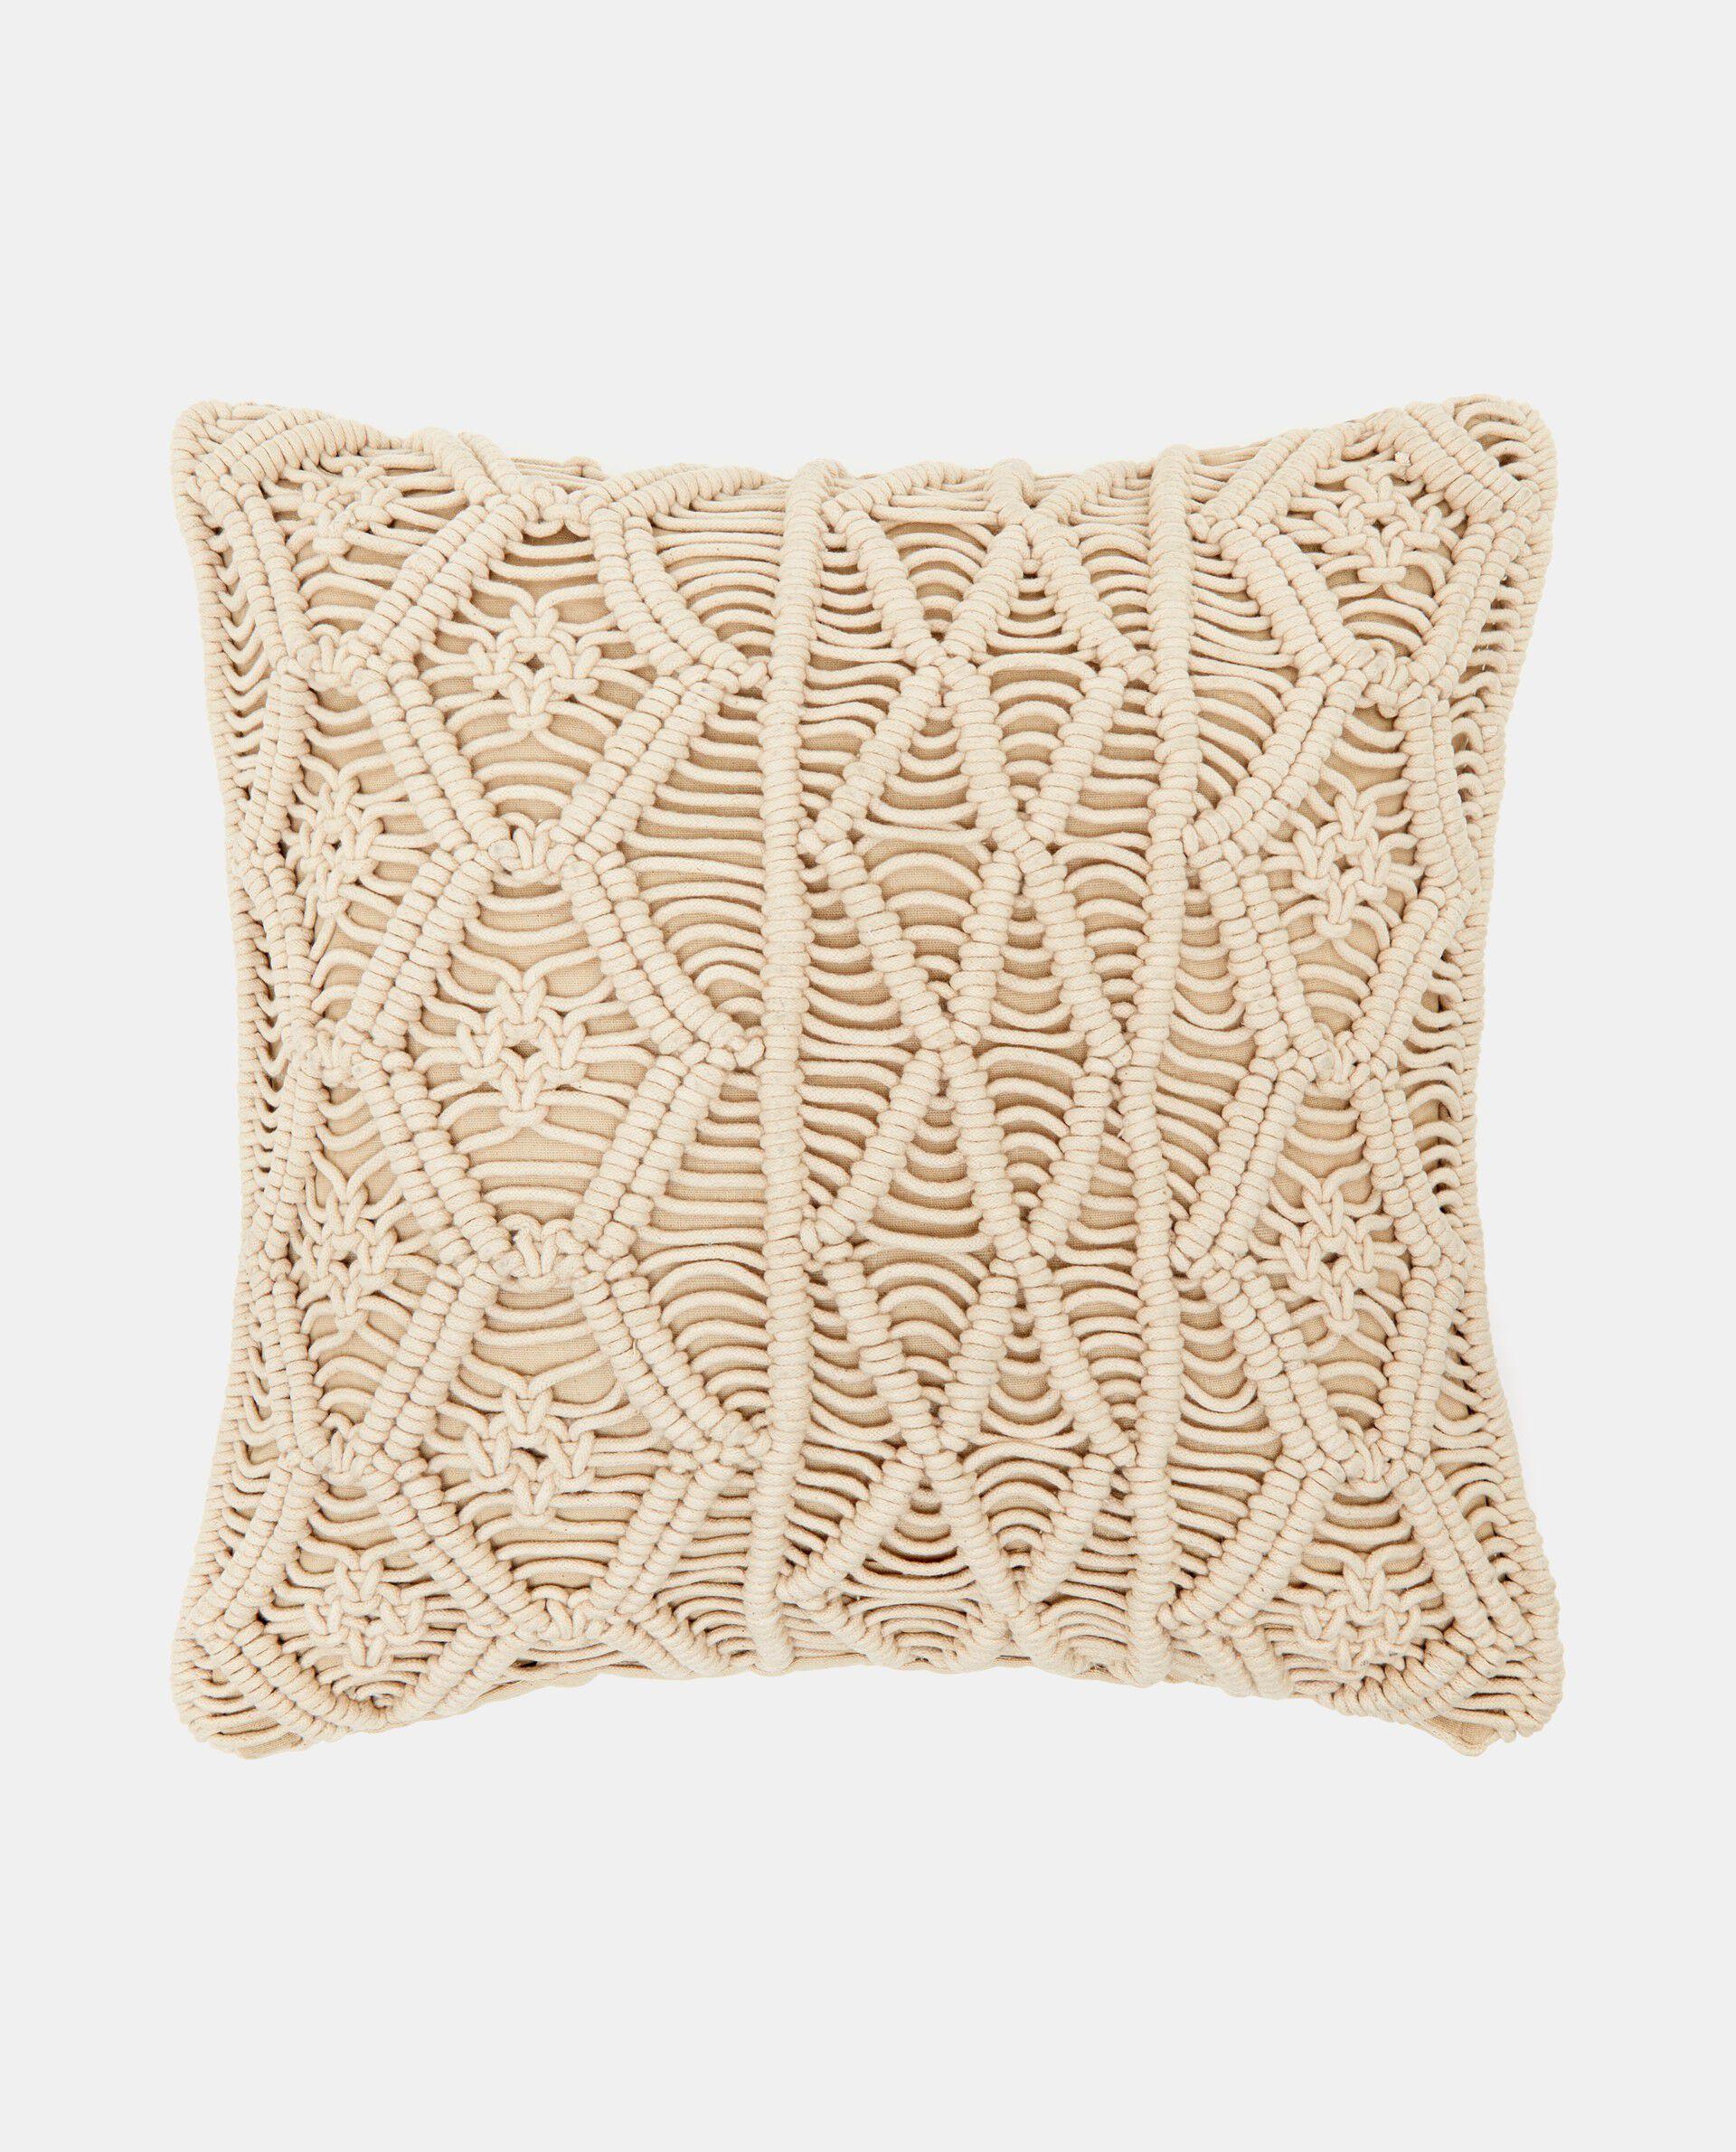 Cuscino in cotone macramé beige